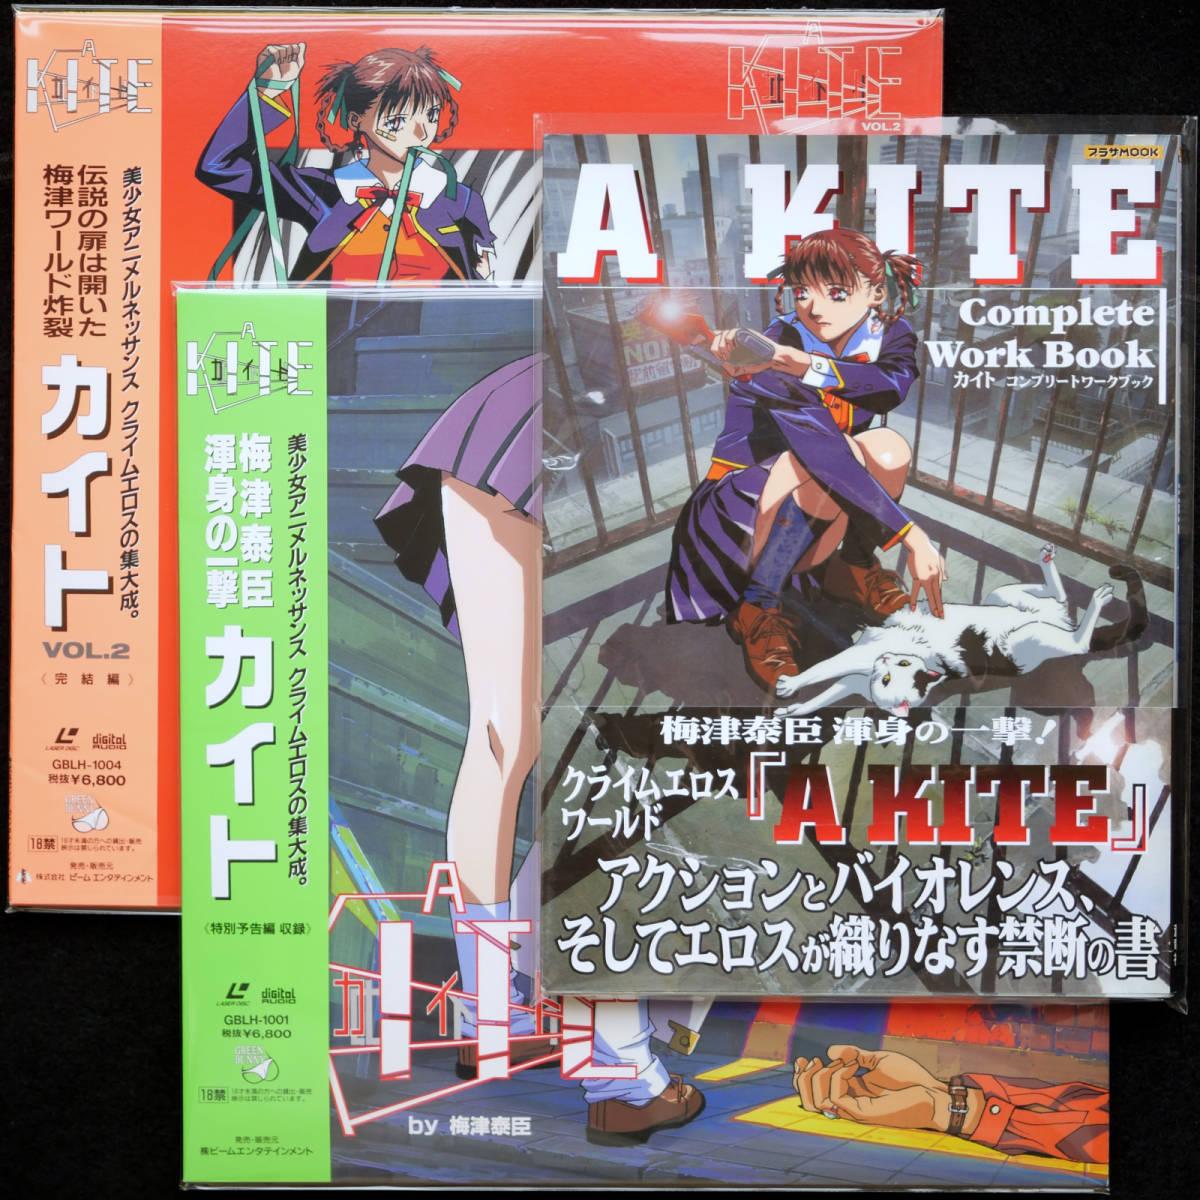 A Kite カイト ld カイト kite梅津泰臣 全2巻 + コンプリートワークブックセット